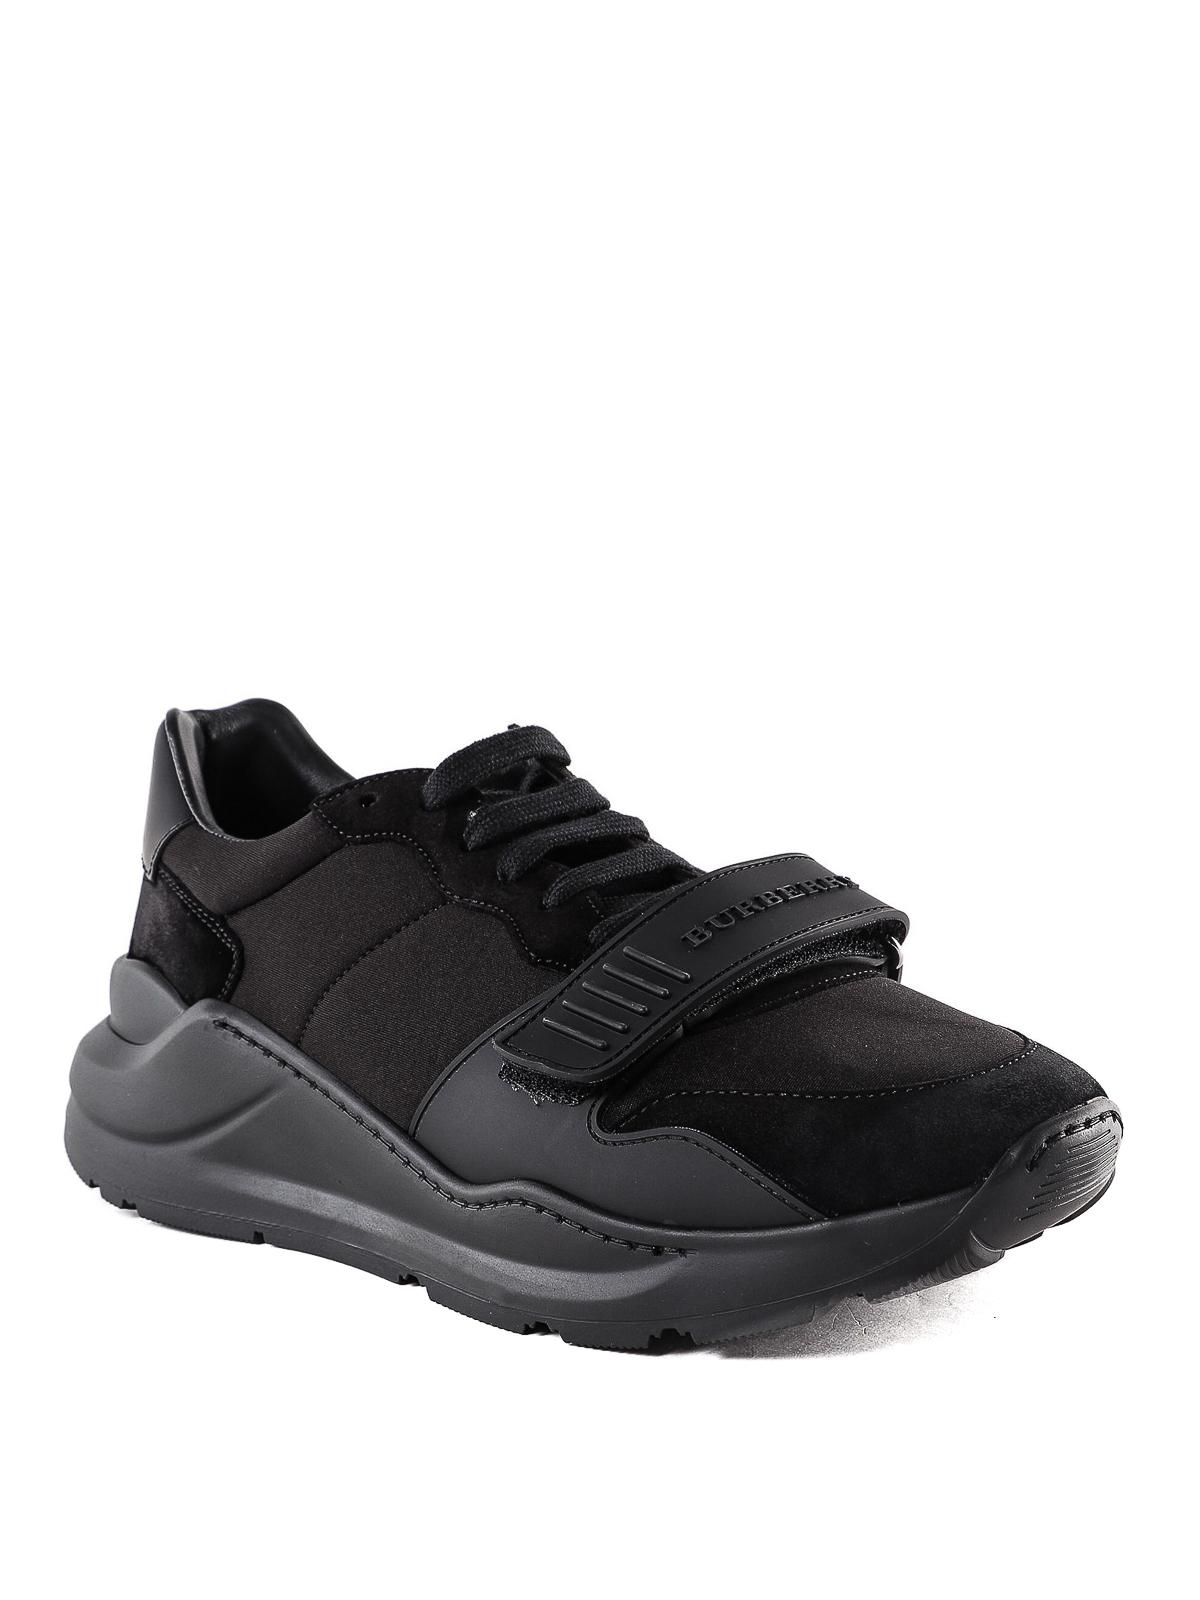 Burberry - Regis black sneakers